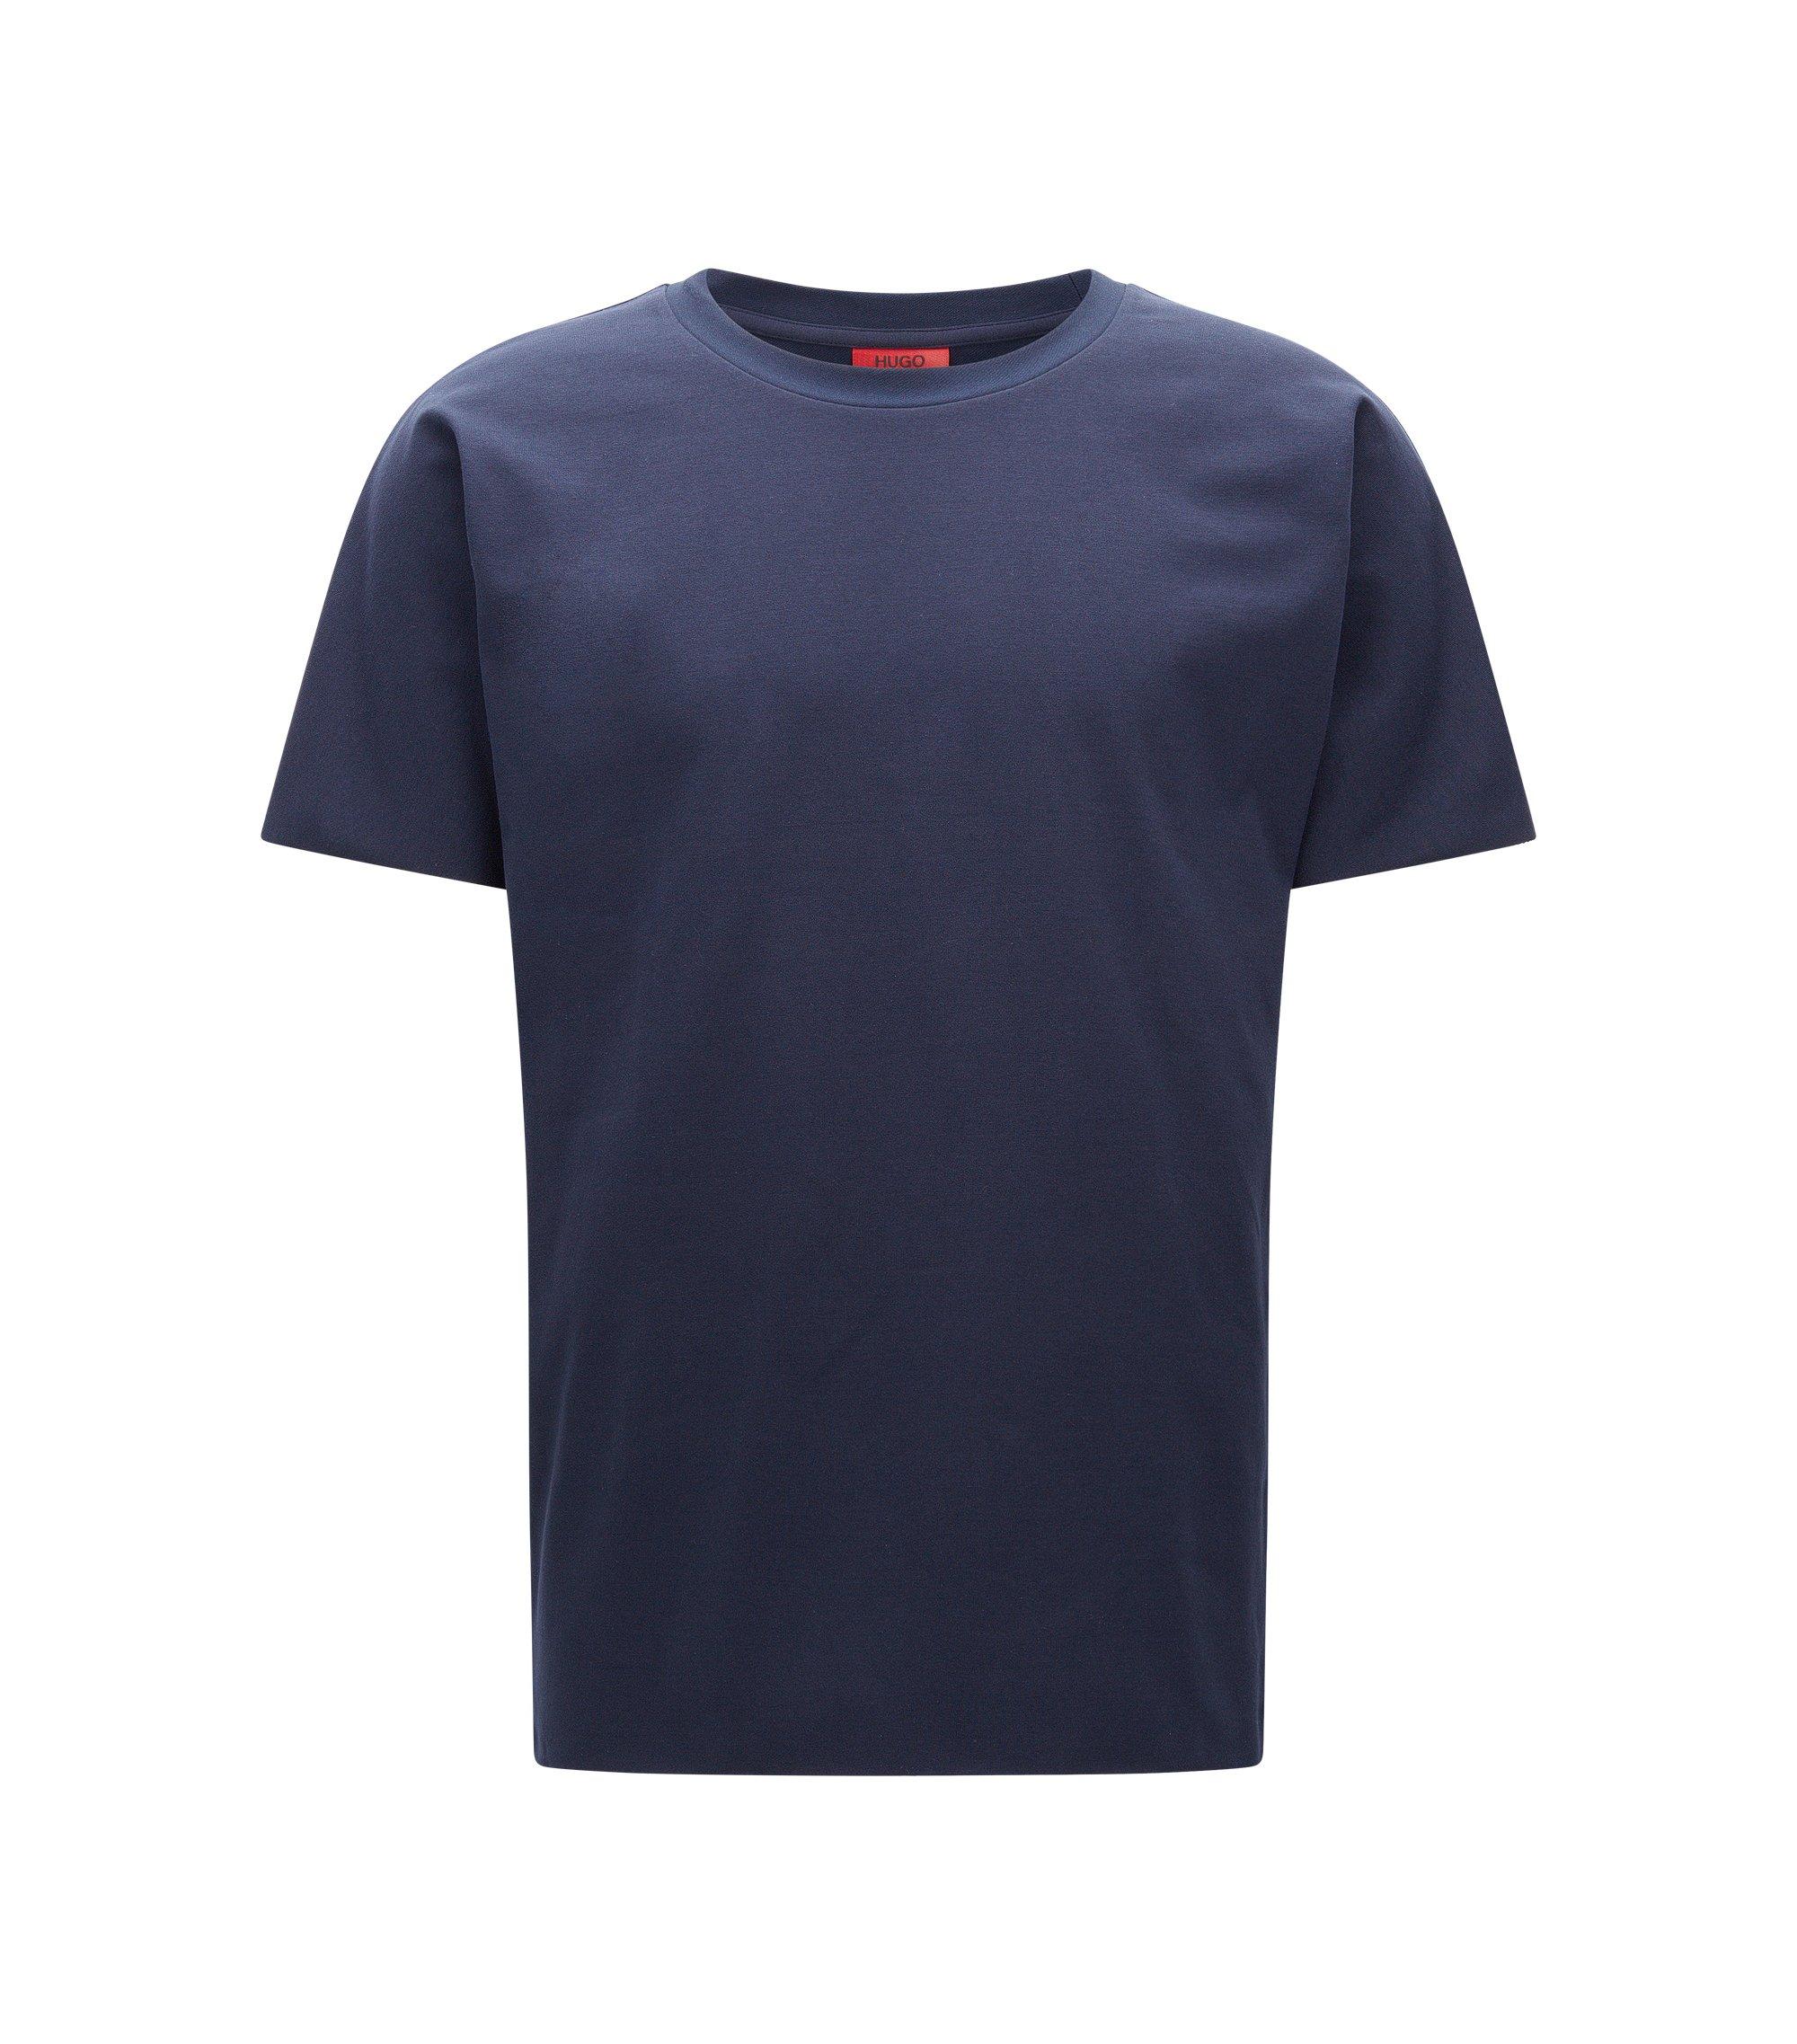 Relaxed-fit T-shirt in een twill van badstof, Donkerblauw